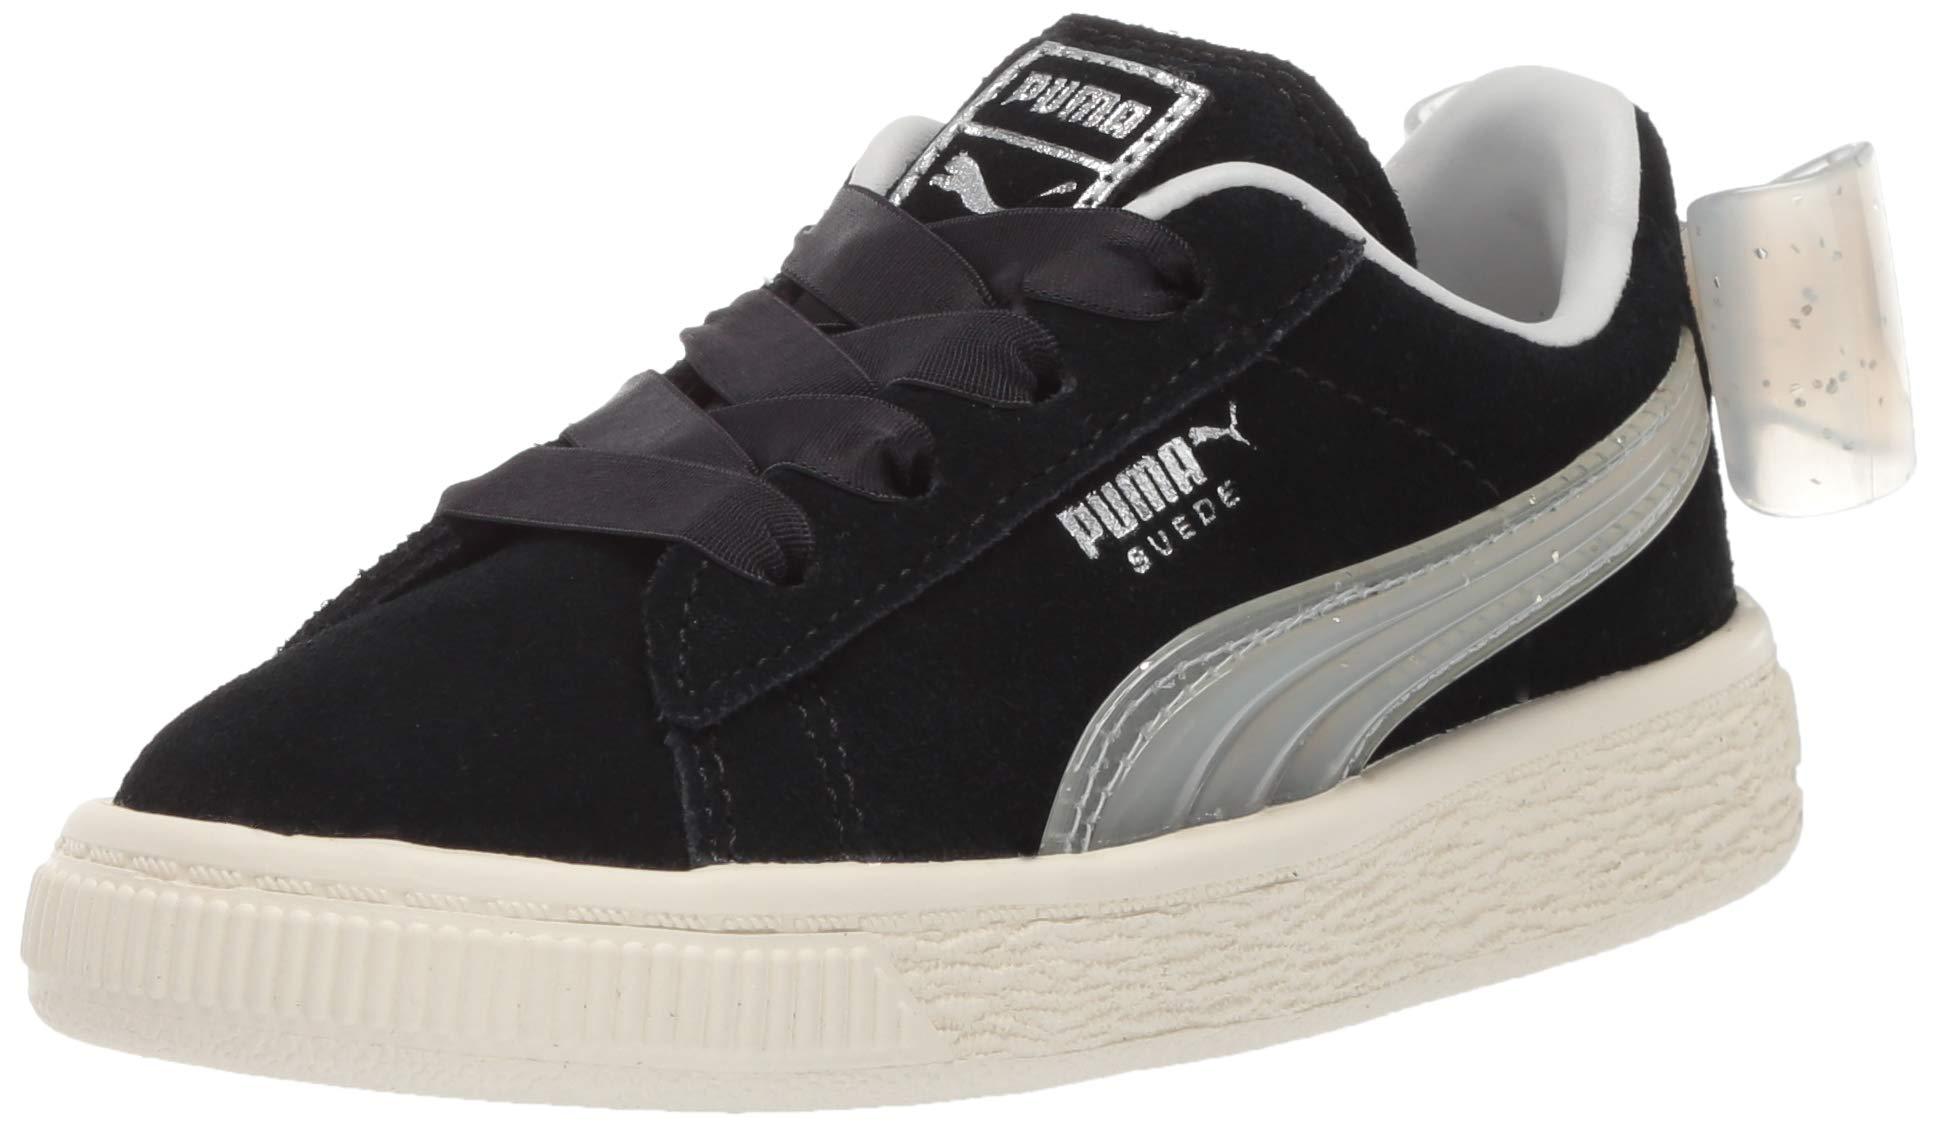 PUMA Girls' Suede Bow Jelly Sneaker, Black-Glacier Gray-Silver, 12 M US Little Kid